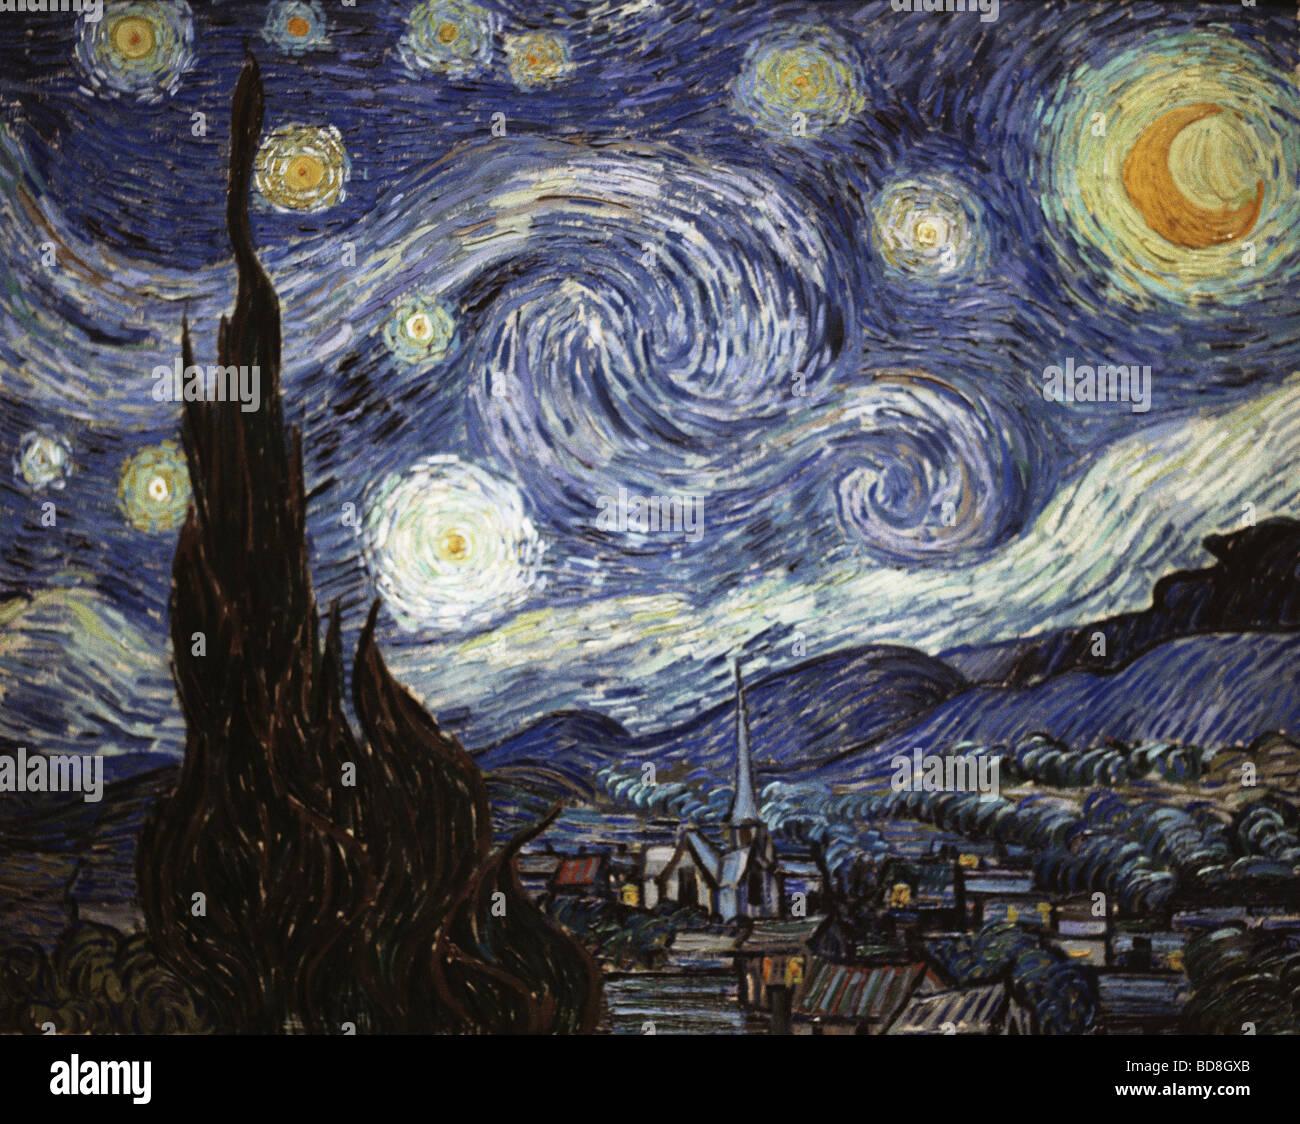 "Belle arti, Gogh, Vincent van, (1853 - 1890), pittura, ""Notte stellata"", olio su tela, 73 x 92 cm, 1889, Immagini Stock"